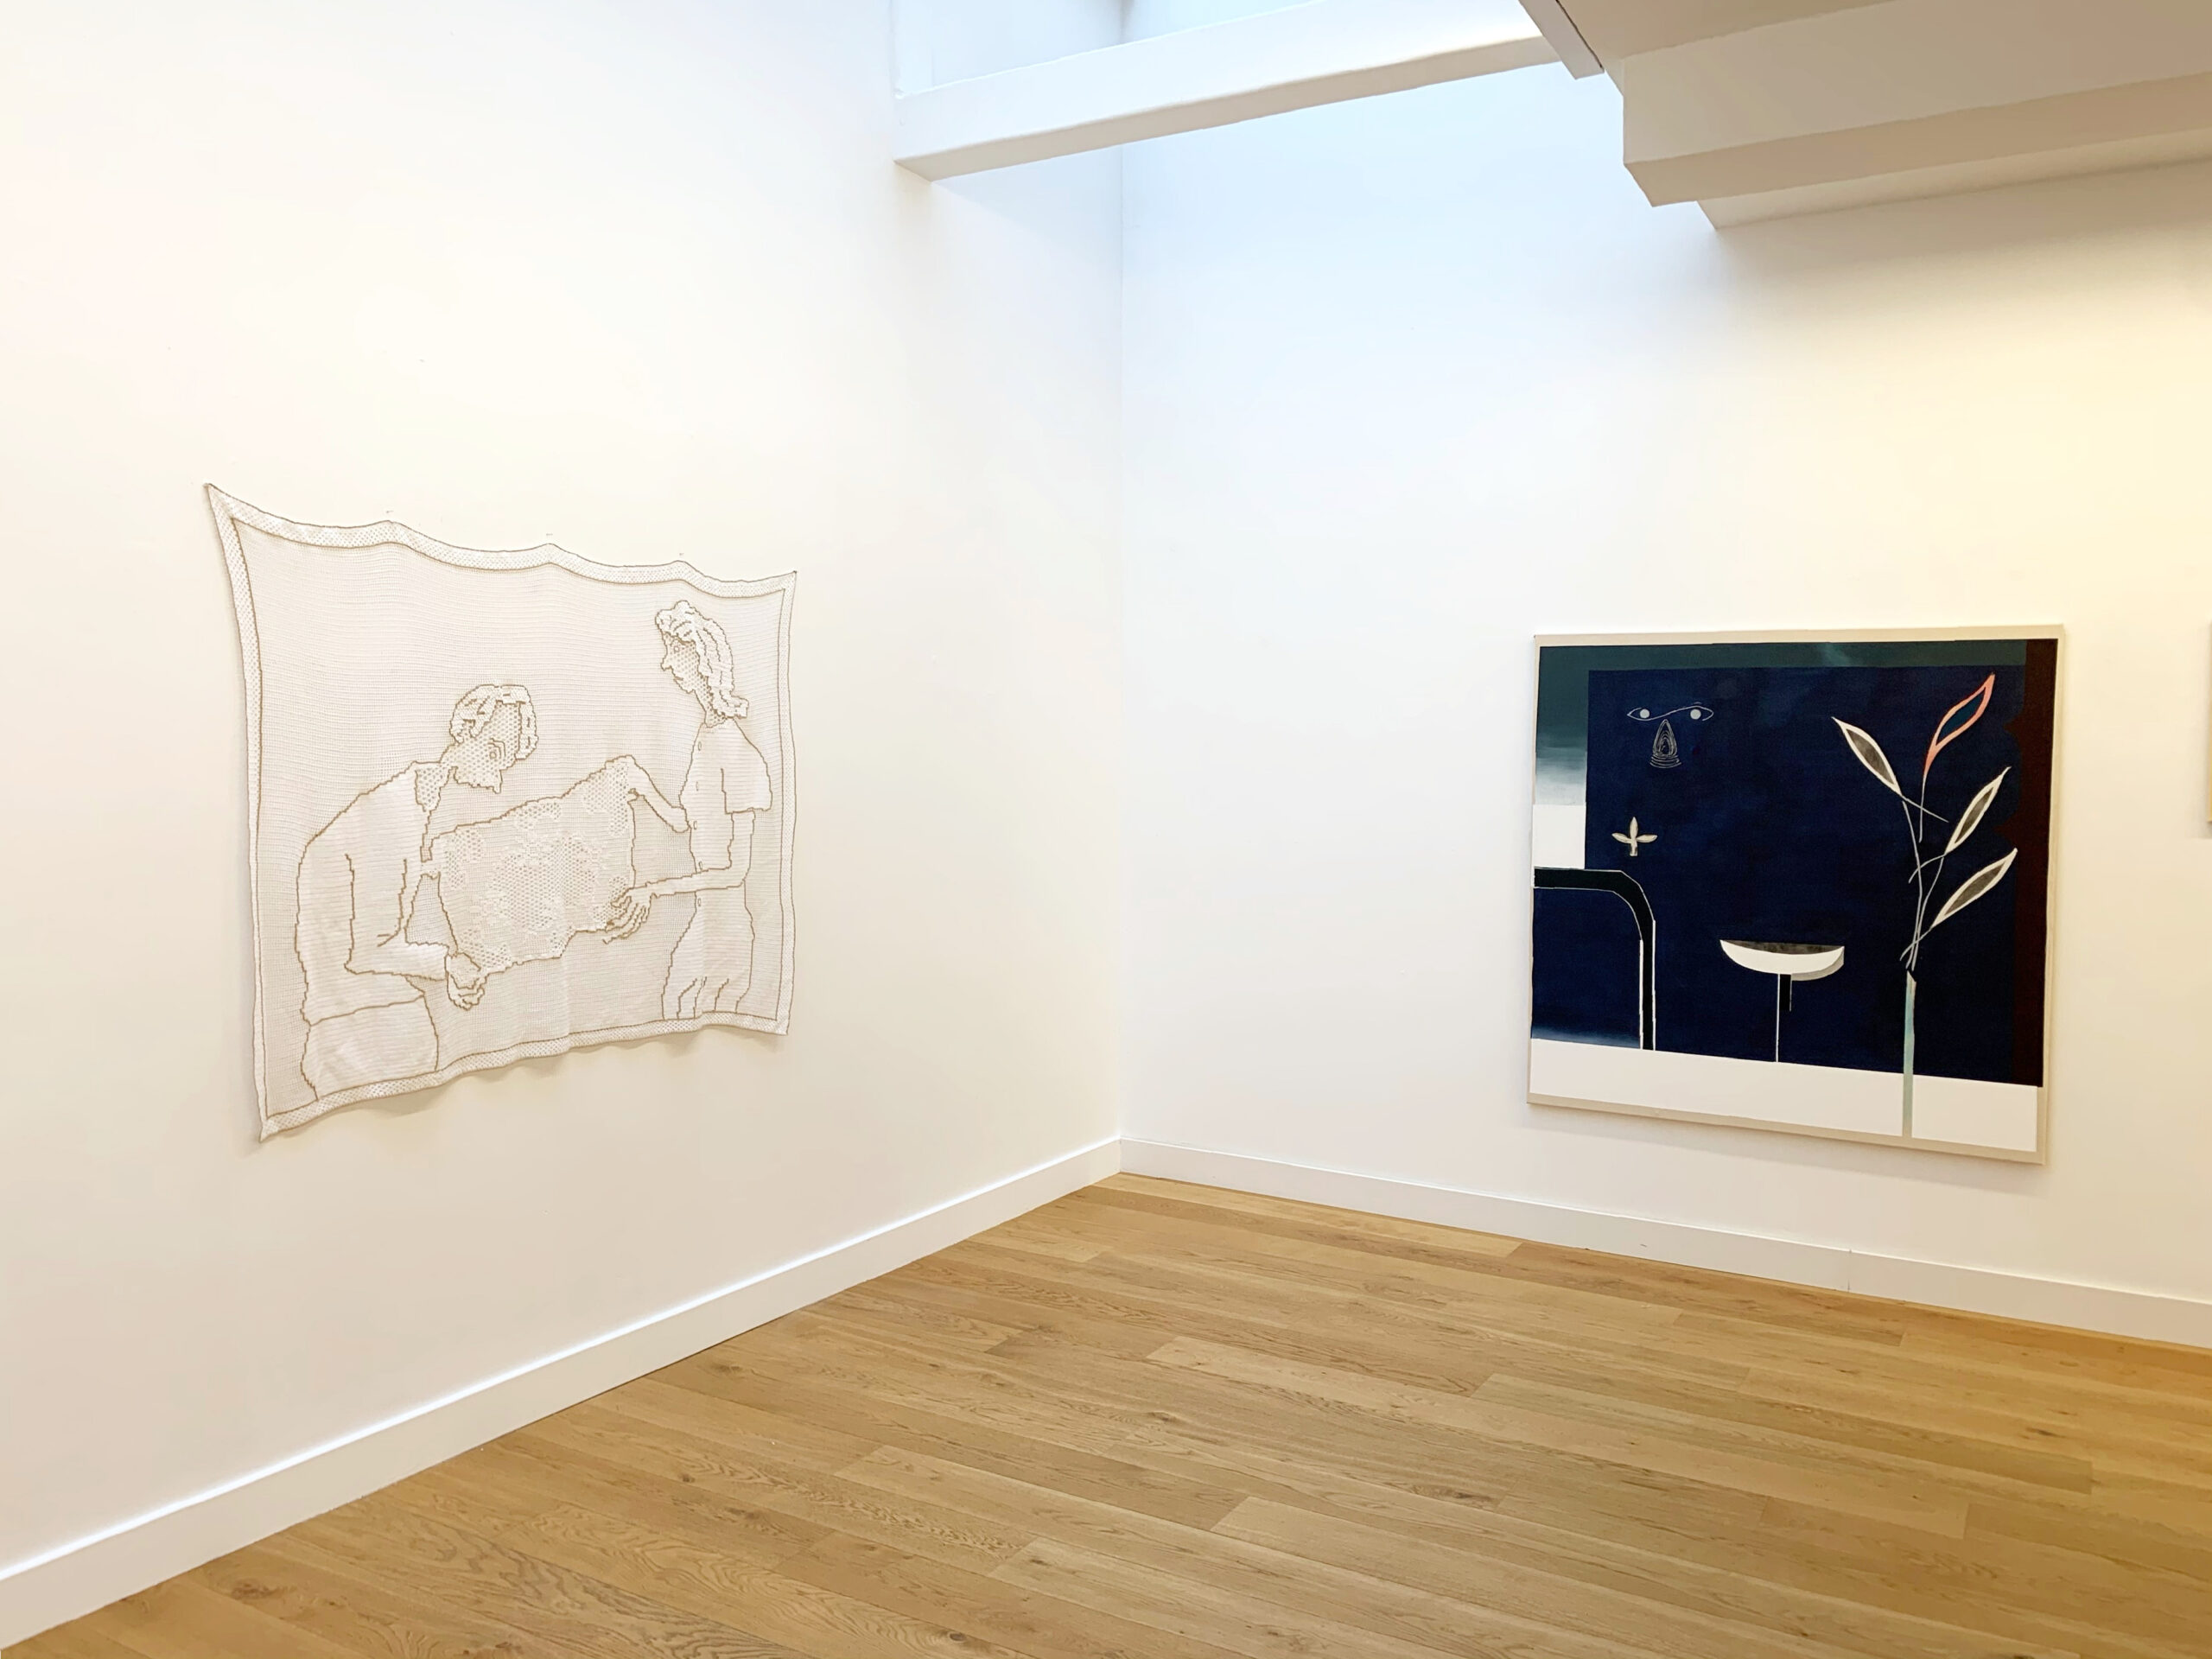 Exhibition view Alternate Spaces - Flatland Gallery Amsterdam